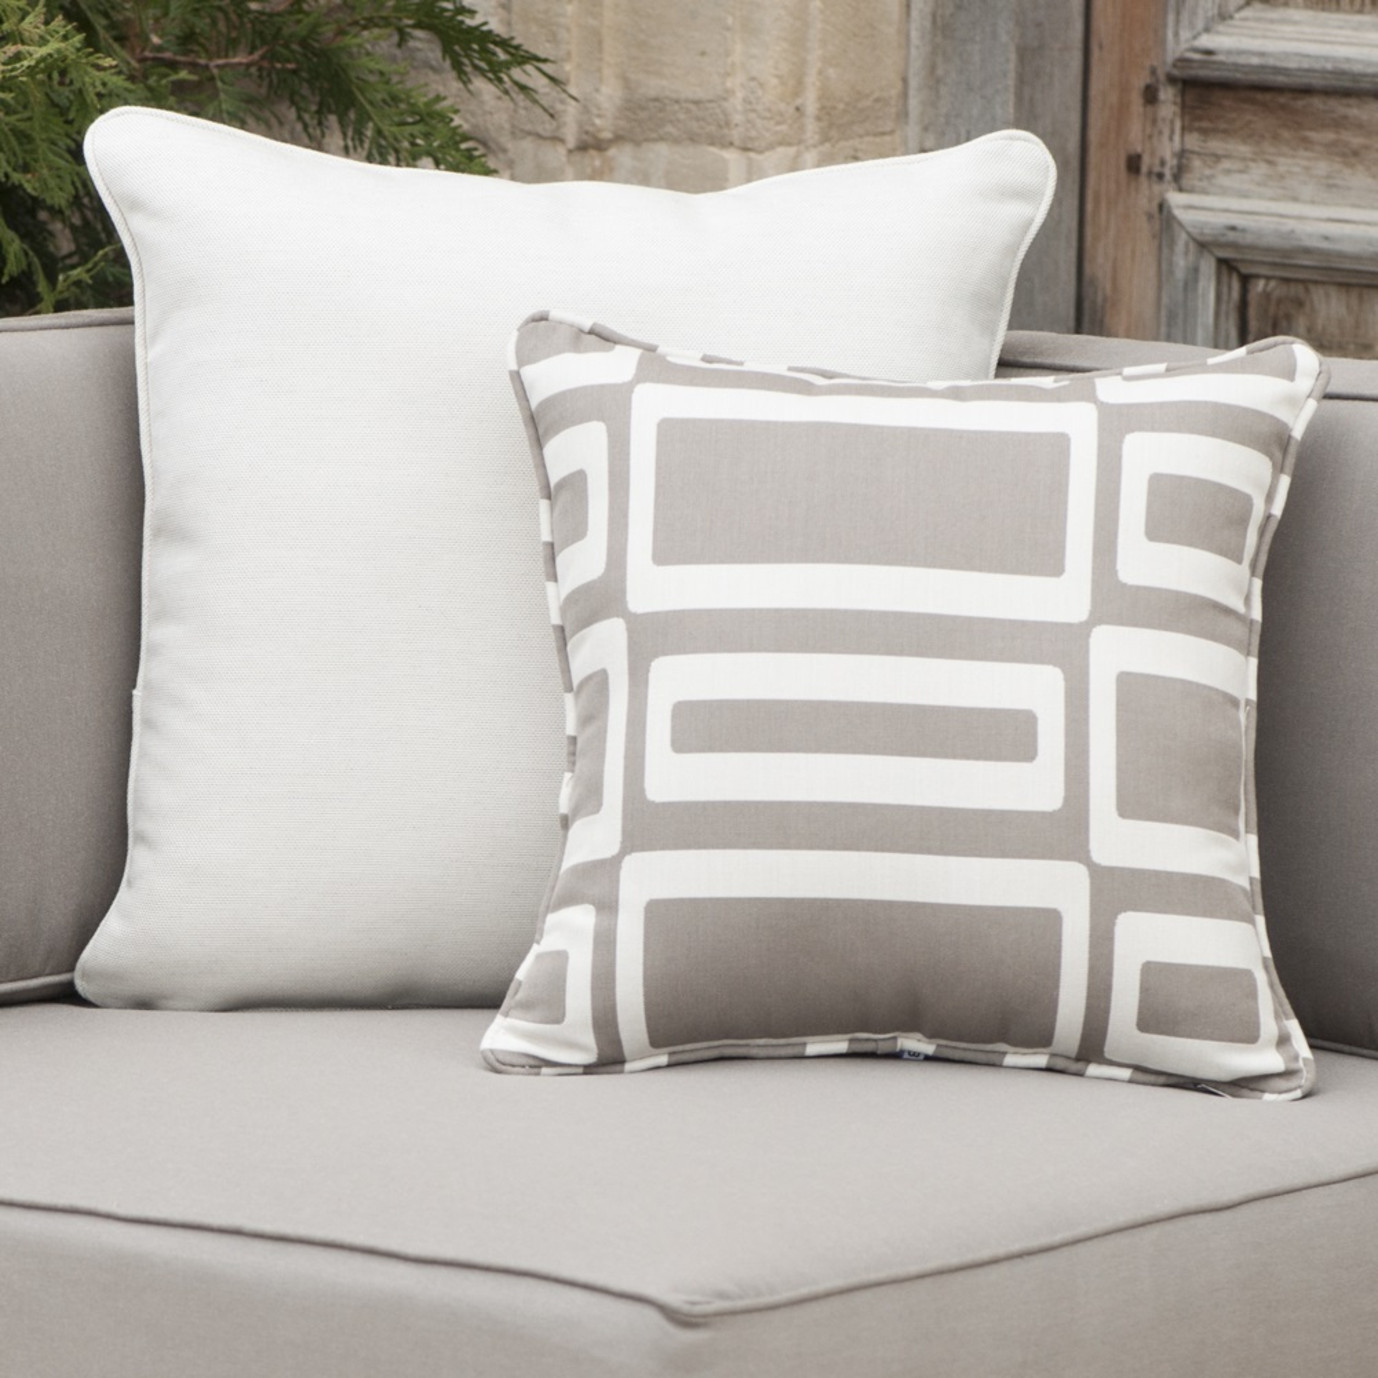 Resort™ Deluxe 6 Piece Seating Set - Weathered Grey